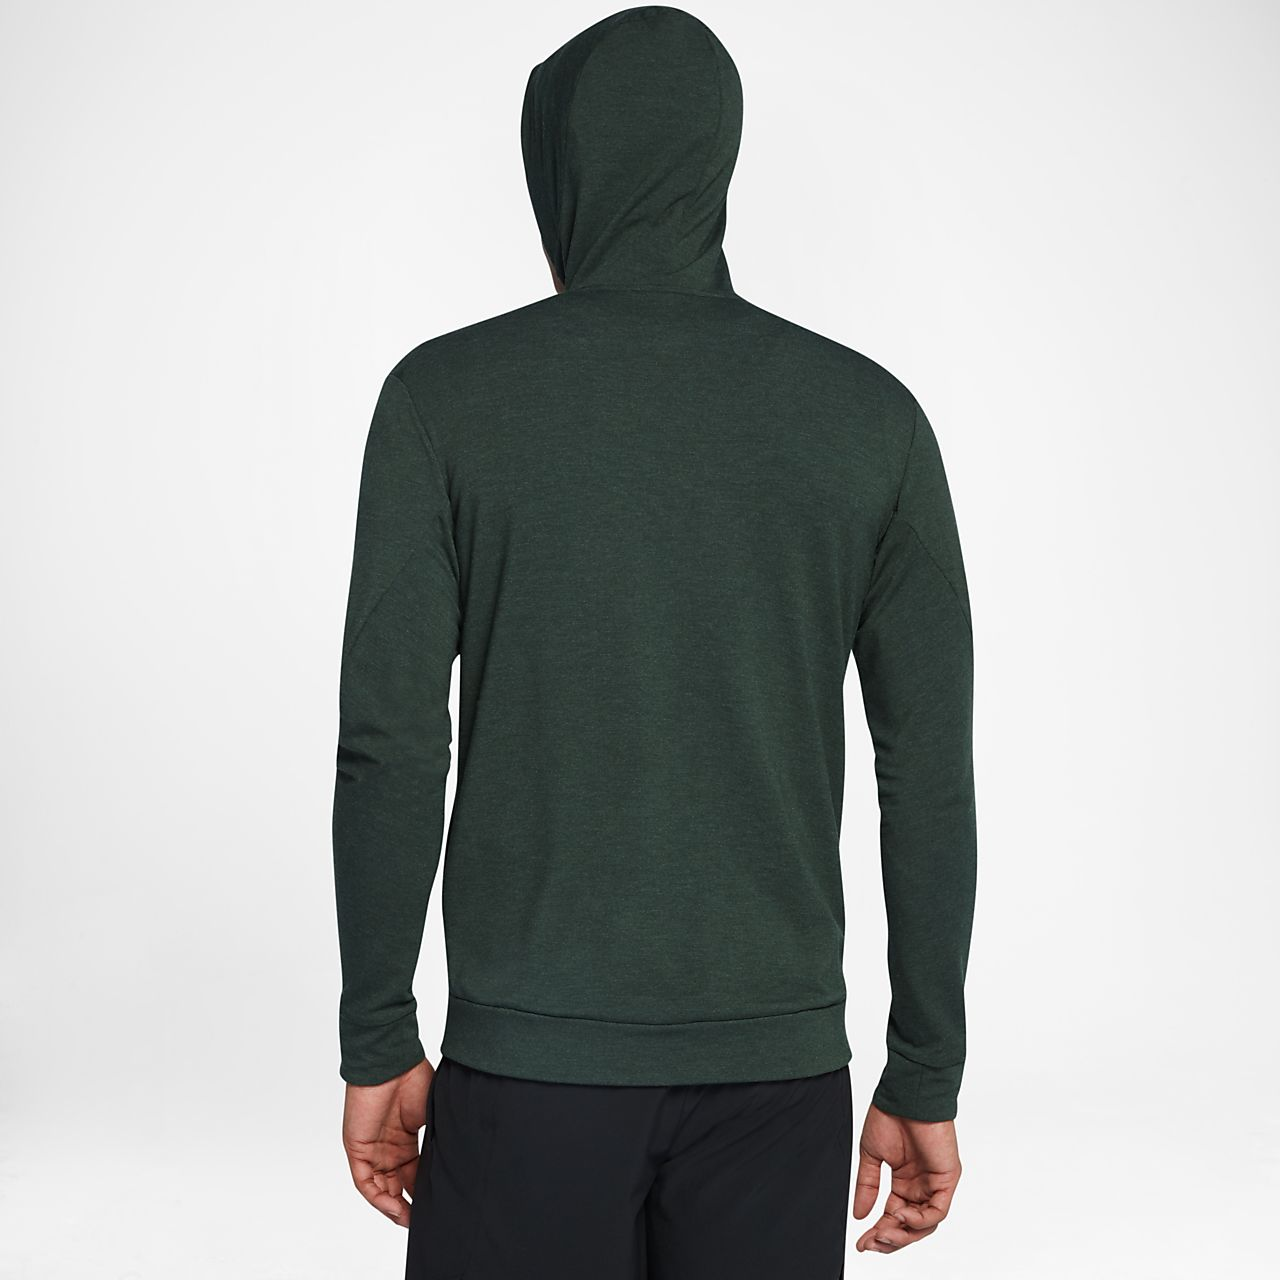 Nike Men's Dry Training Top (Blue)